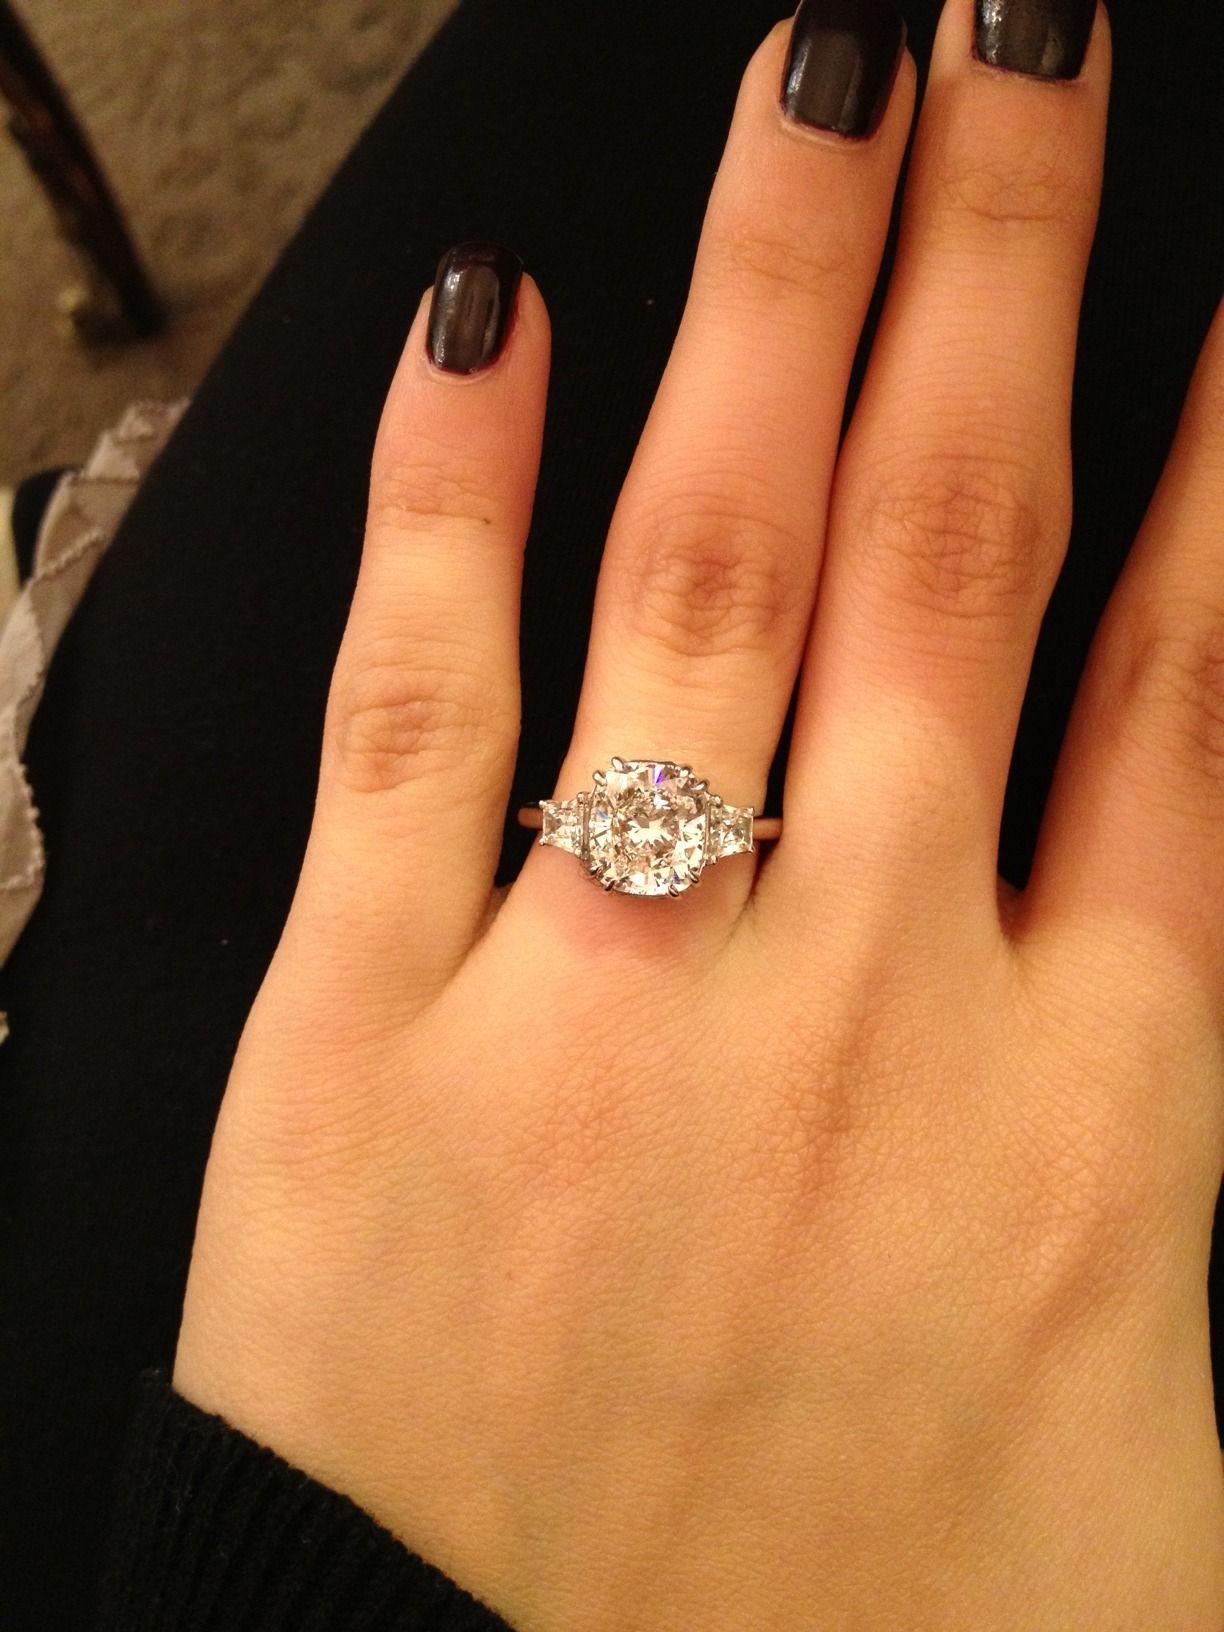 Vintage Wedding Rings Tumblr